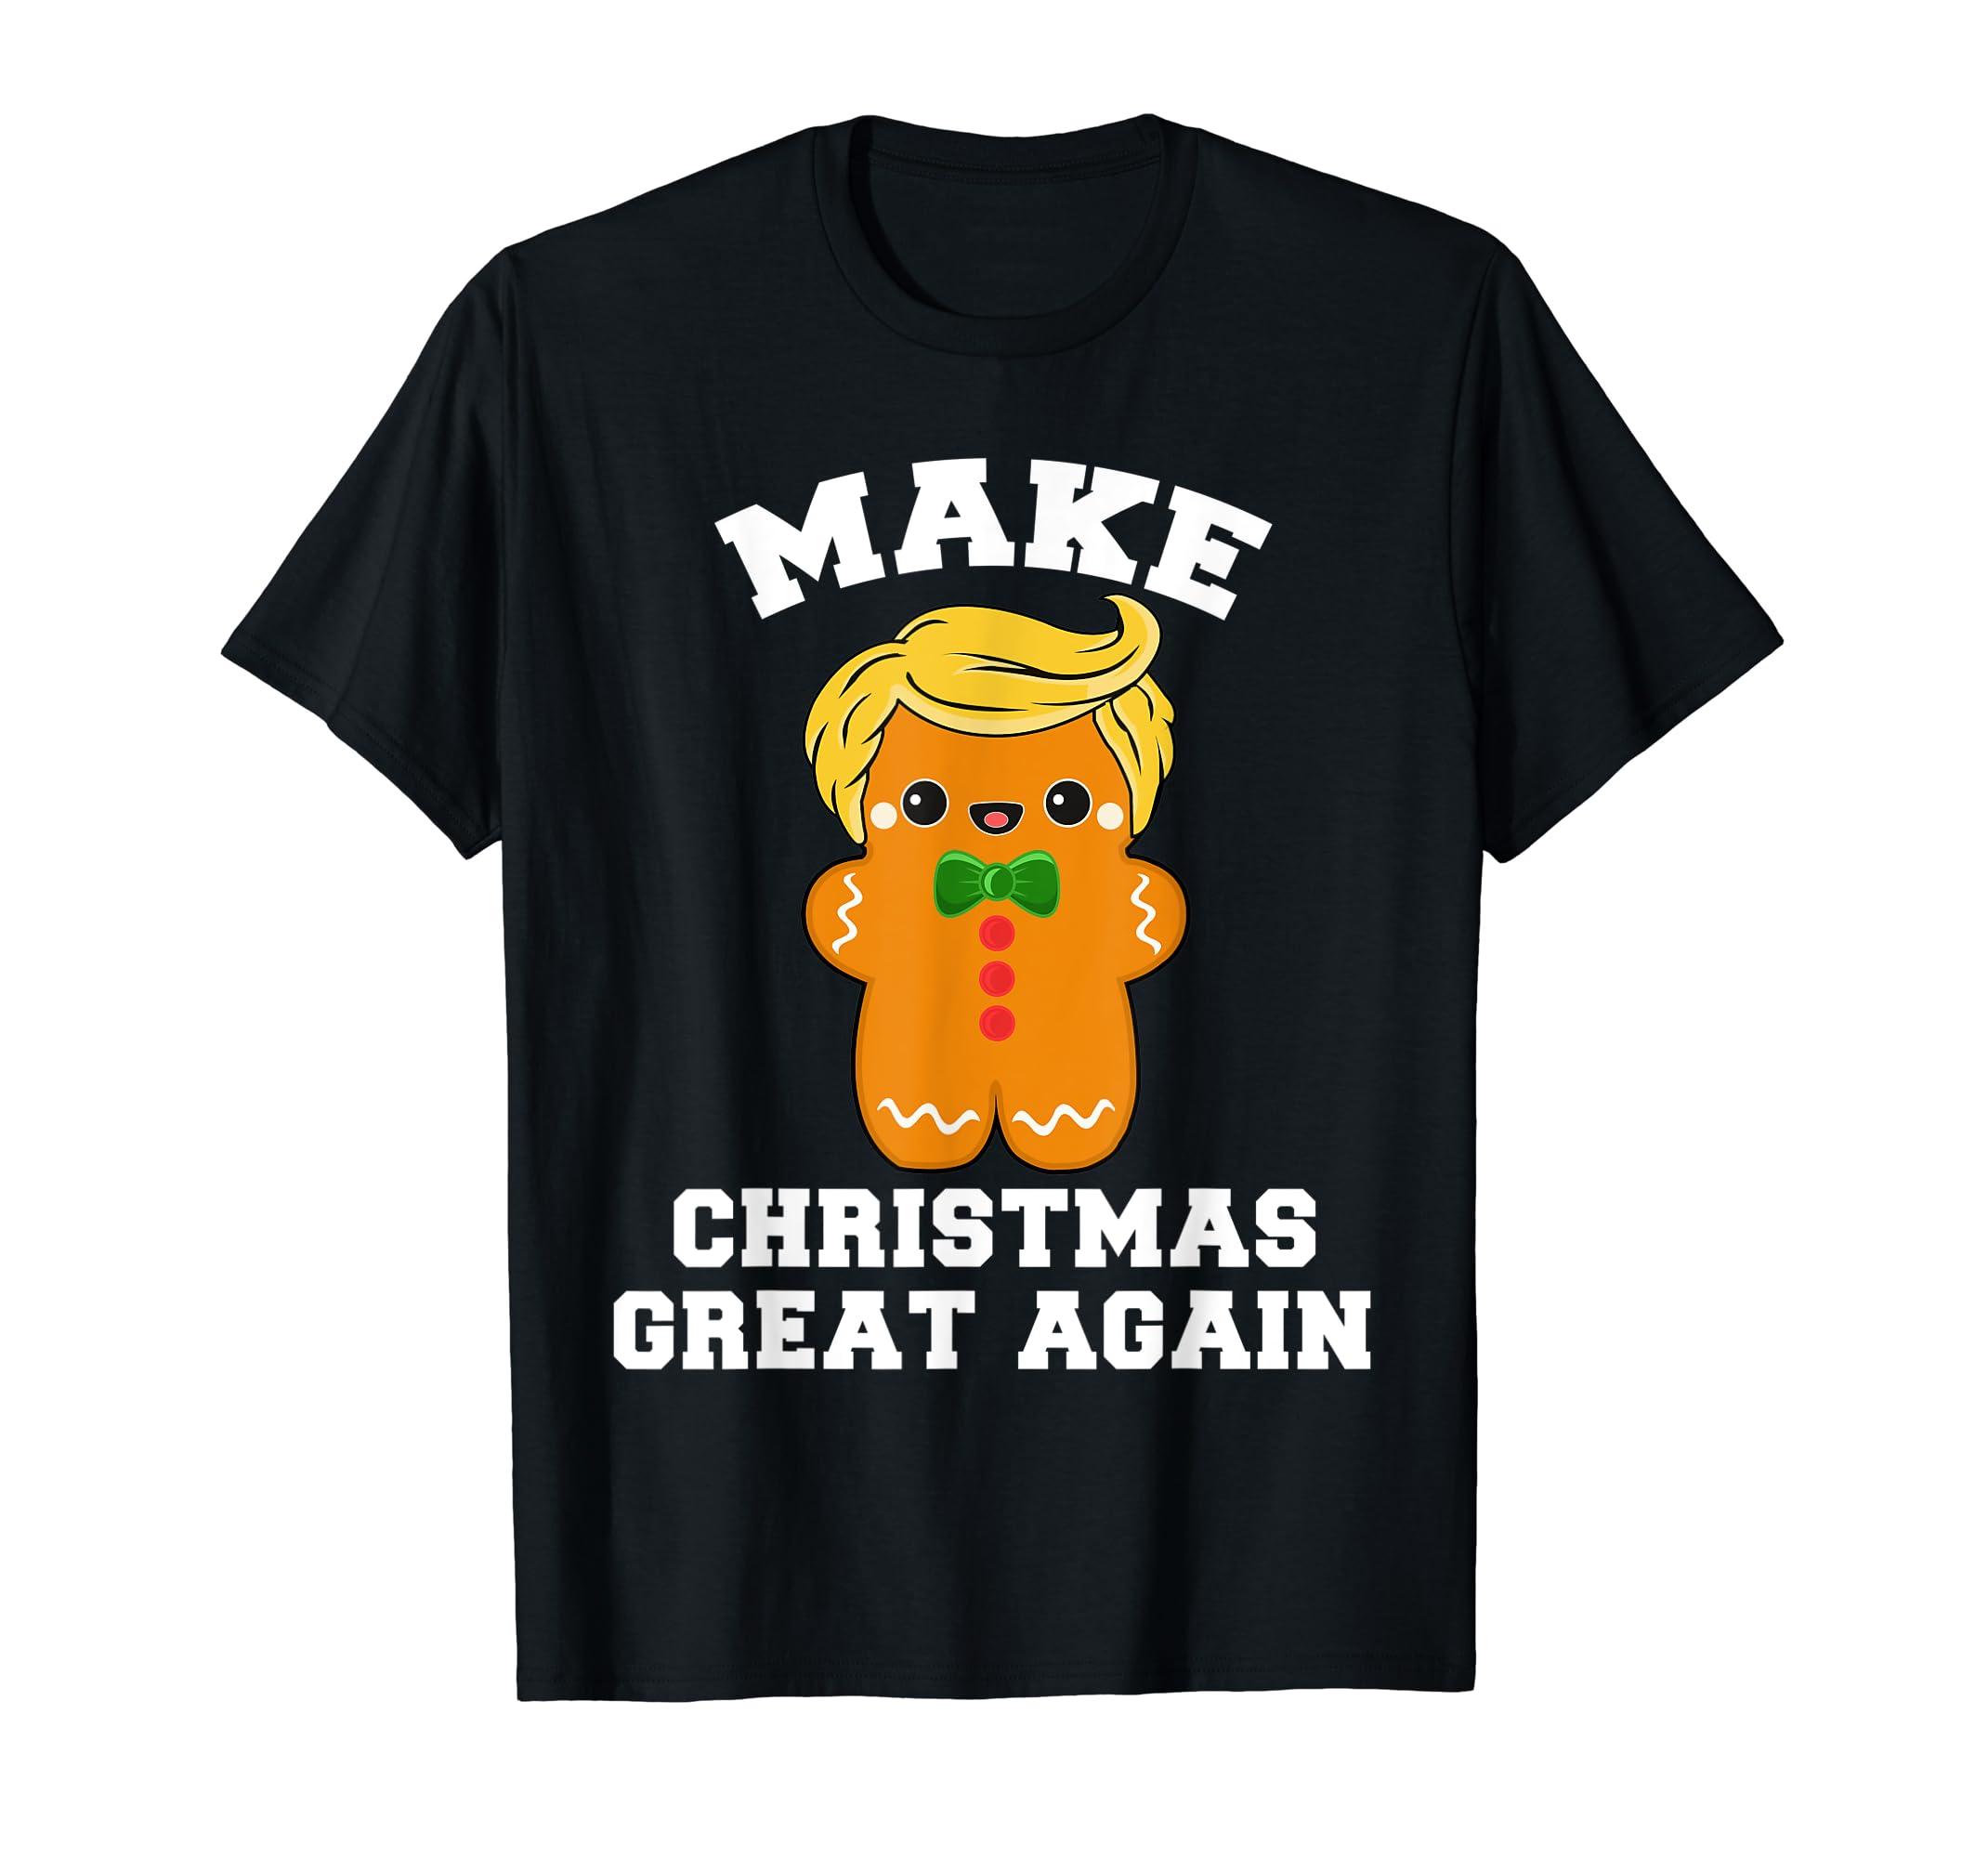 Funny Trump Christmas Gingerbread Man Tee Cute Fun Men Women T-Shirt-Men's T-Shirt-Black